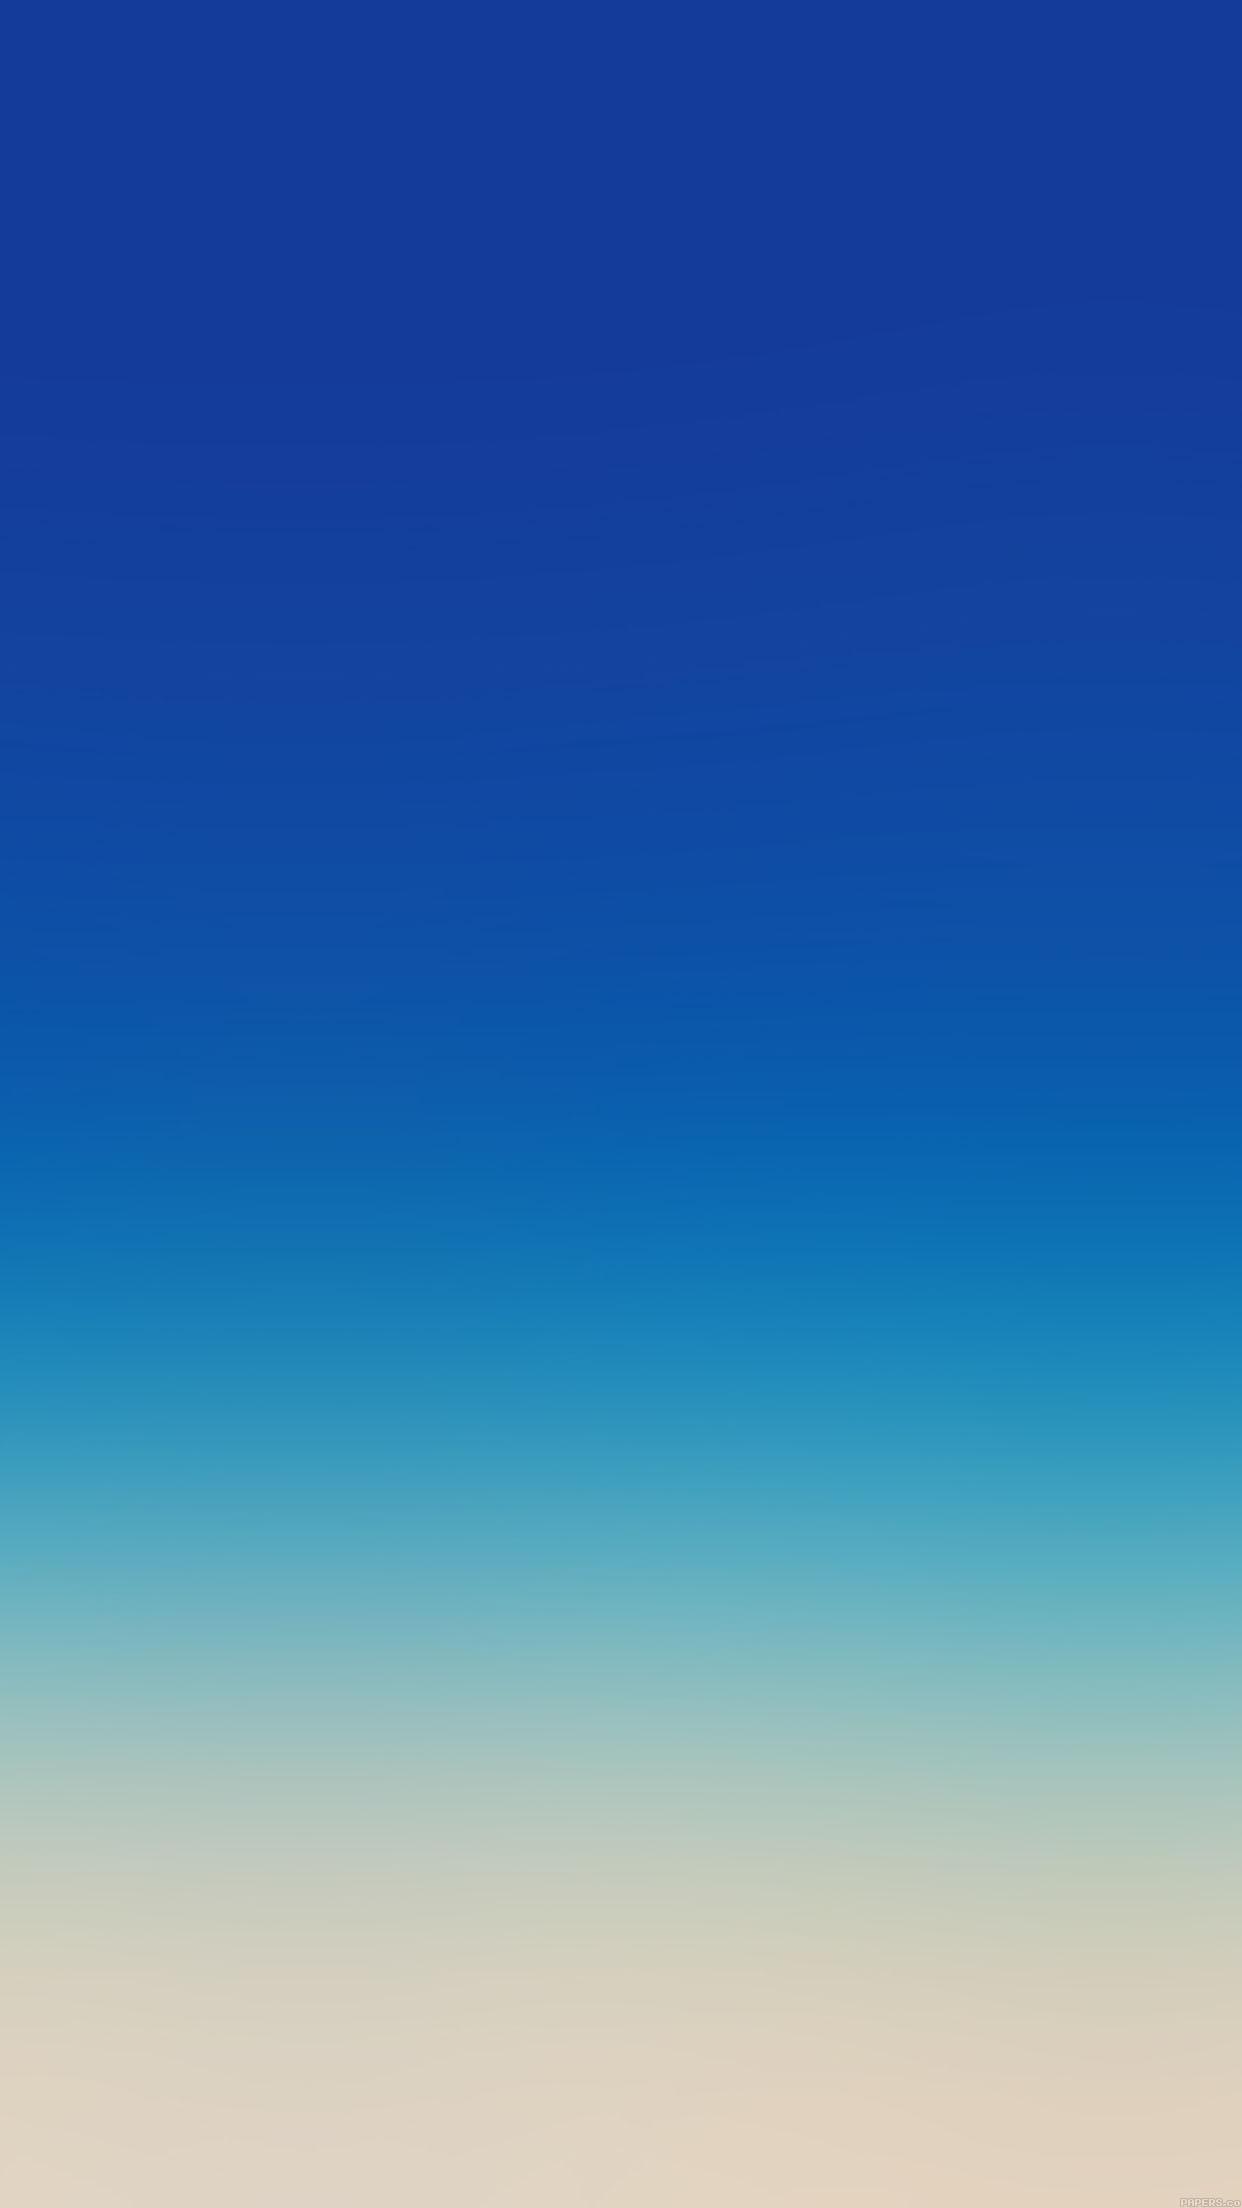 Pastel Cute Wallpaper 1080 Sb10 Wallpaper Blue Sky Blue Blur Papers Co